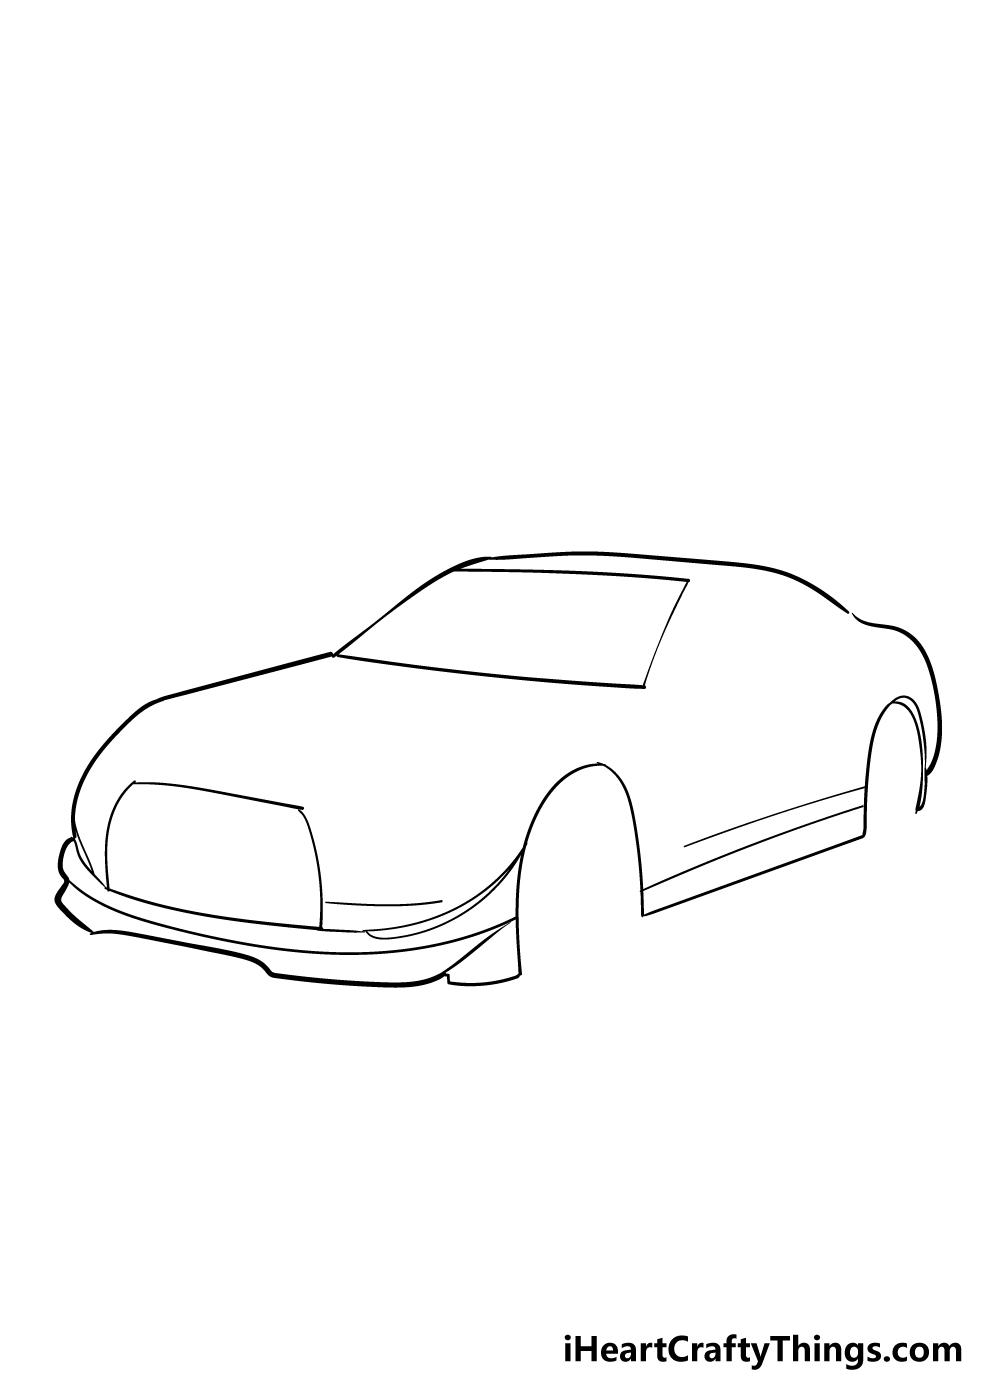 racecar drawing step 2